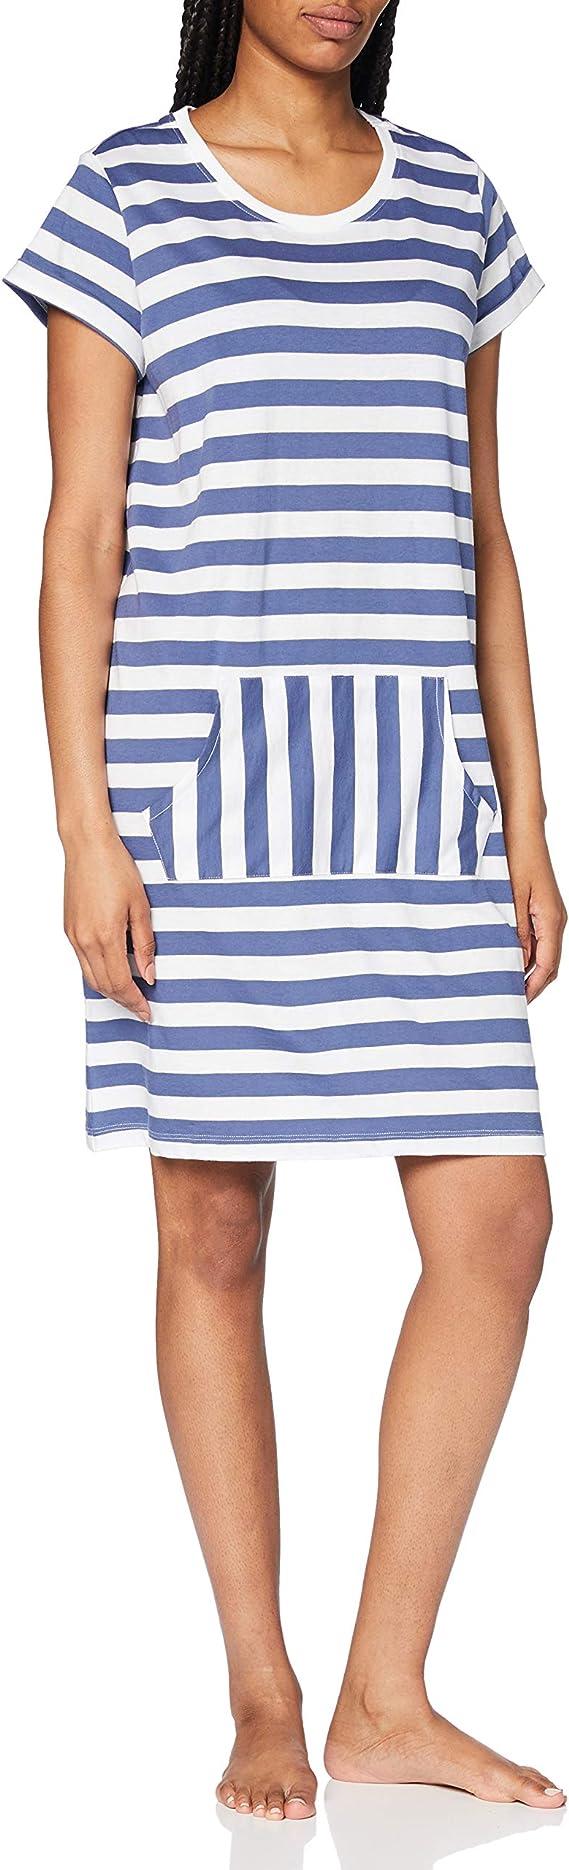 ESPRIT Deenah CAS Nw Pyjama Set di Pigiama Donna